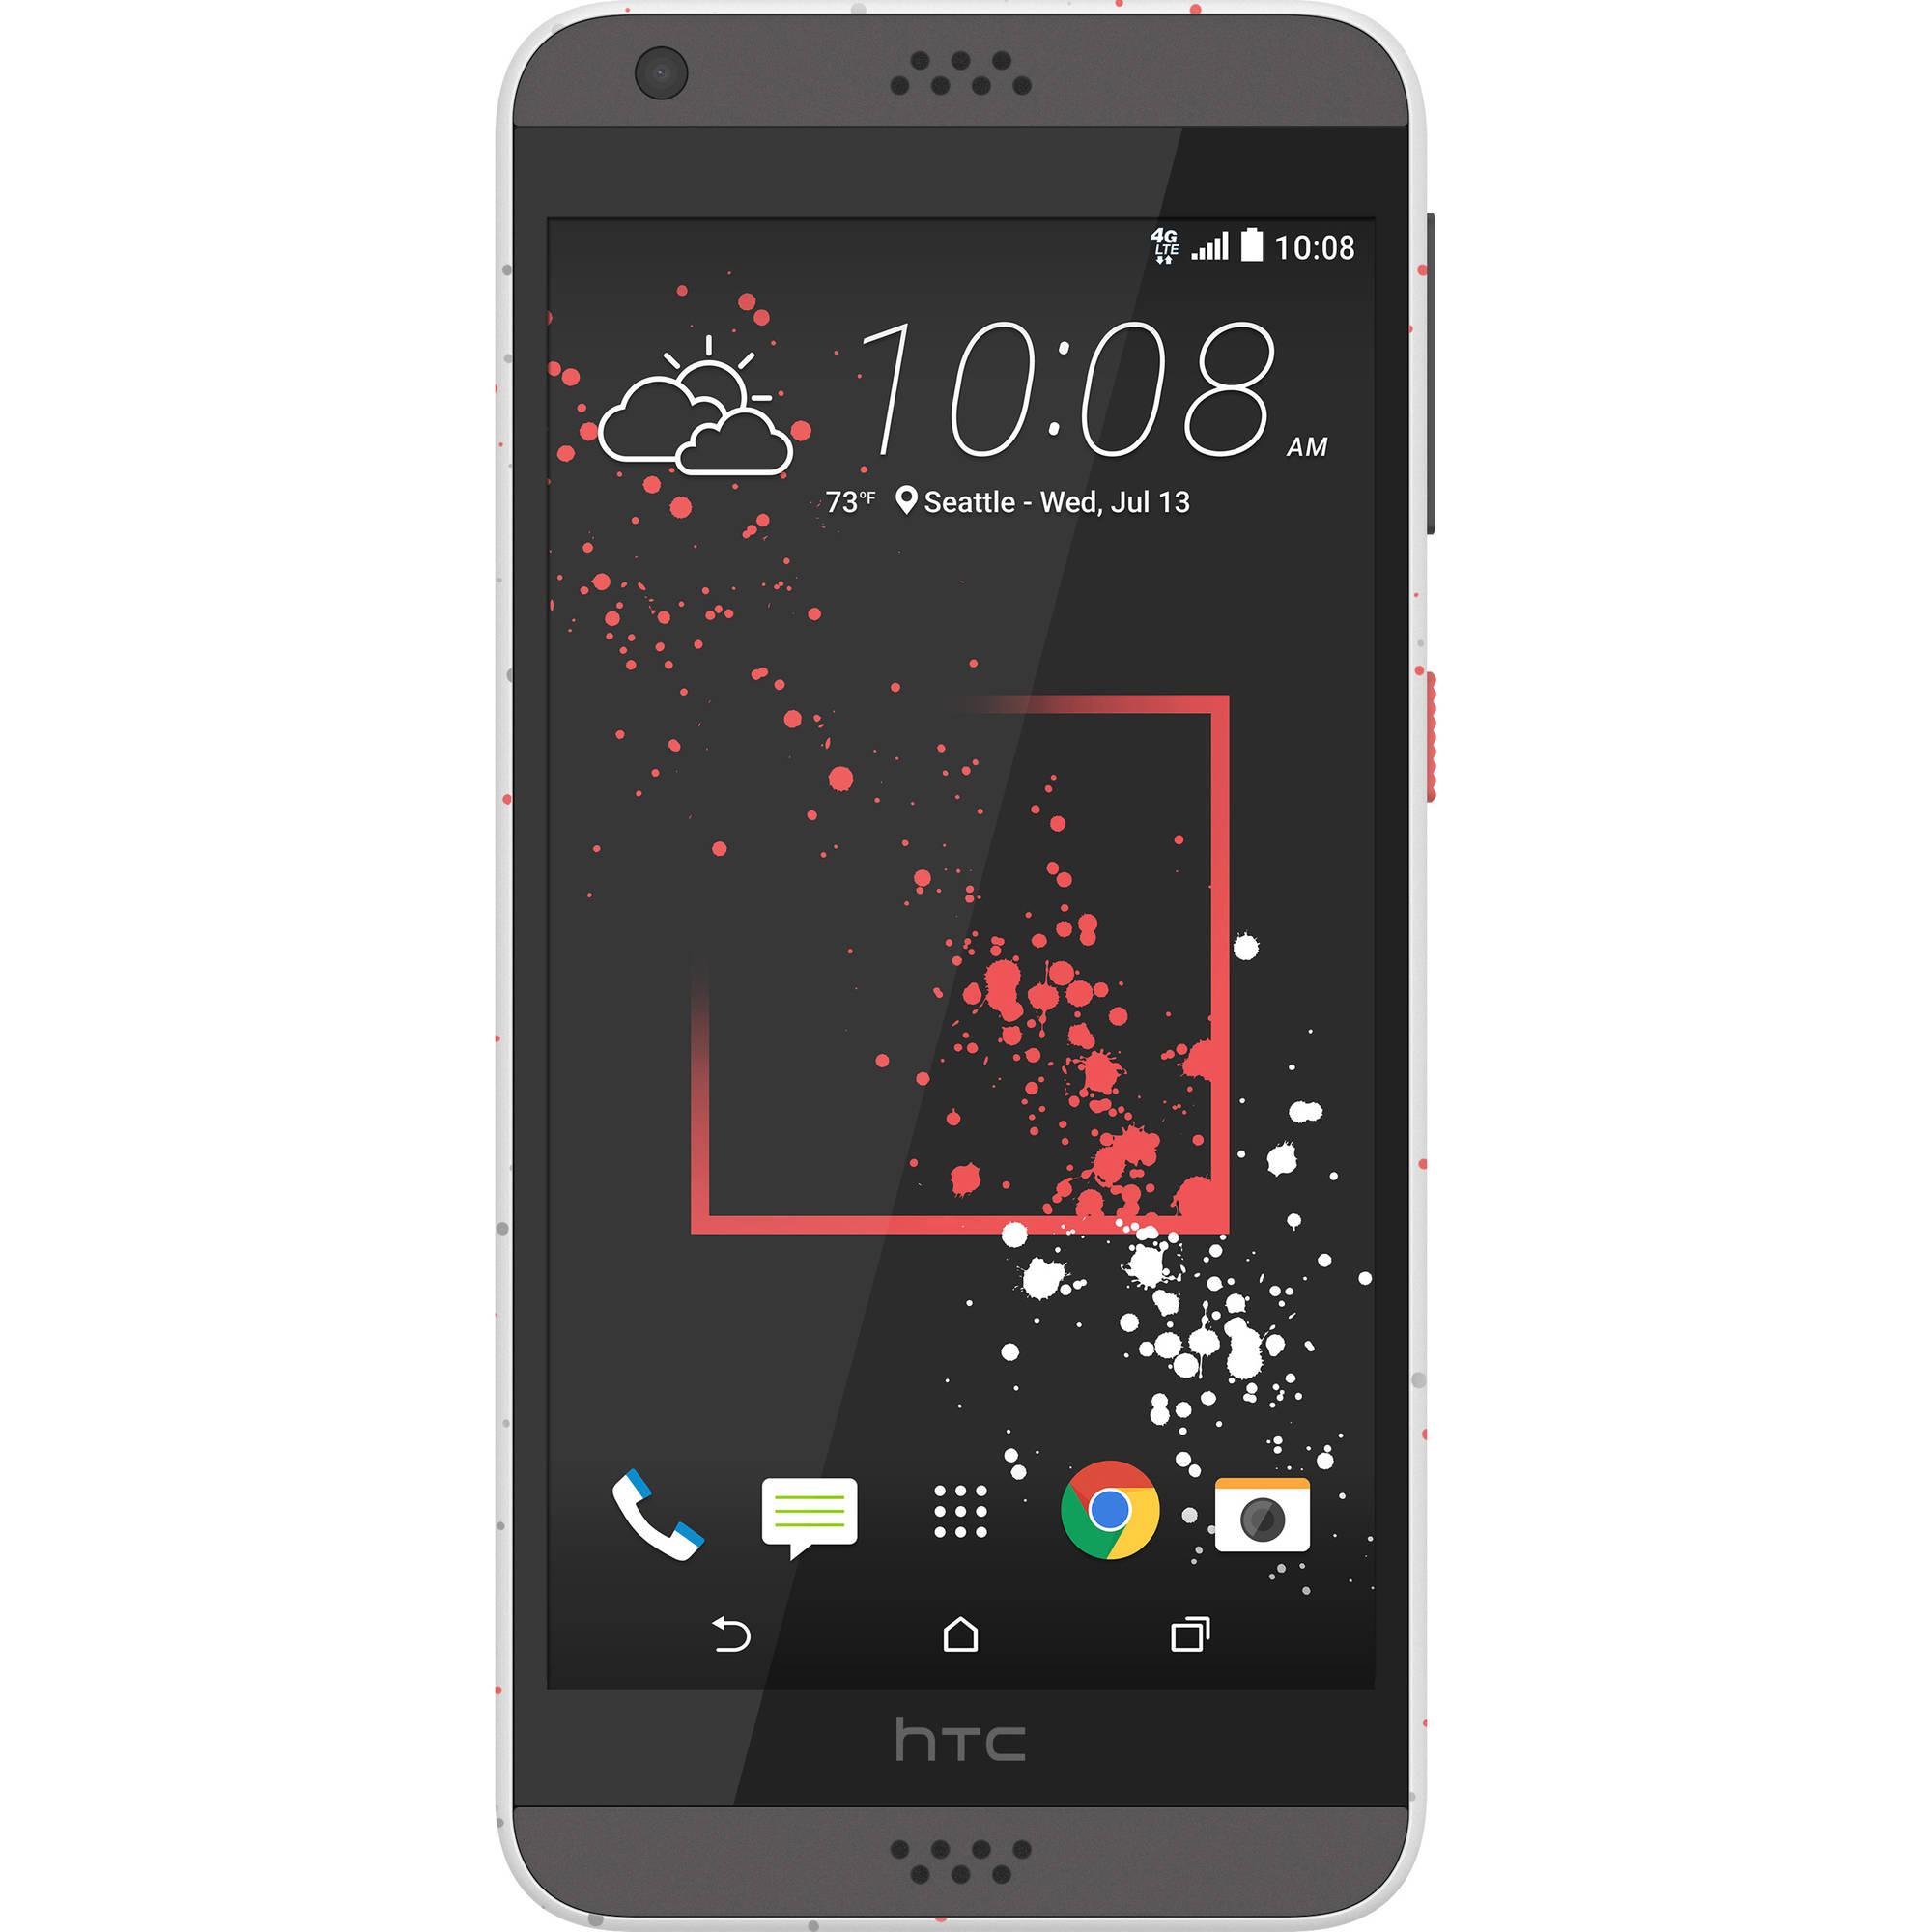 Walmart Family Mobile HTC Desire 530 16GB Prepaid Smartphone, Black